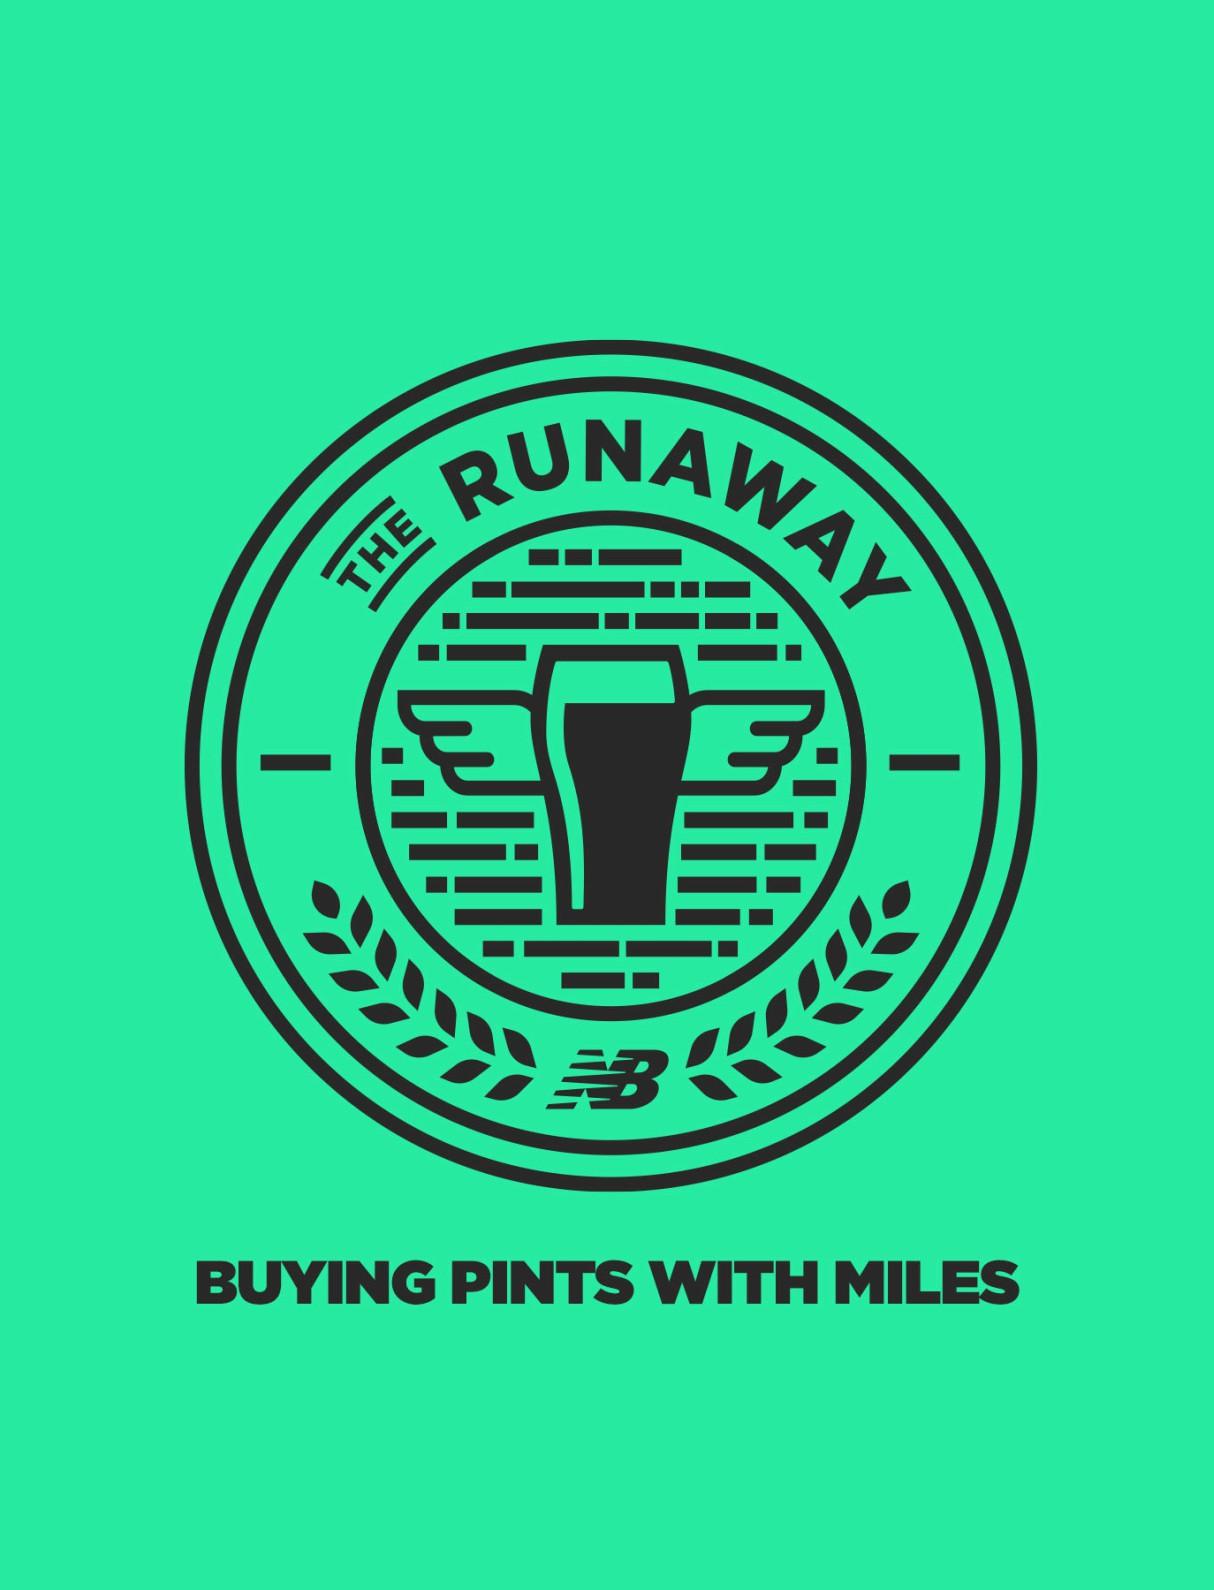 new-balance-strava-runaway-pub-4